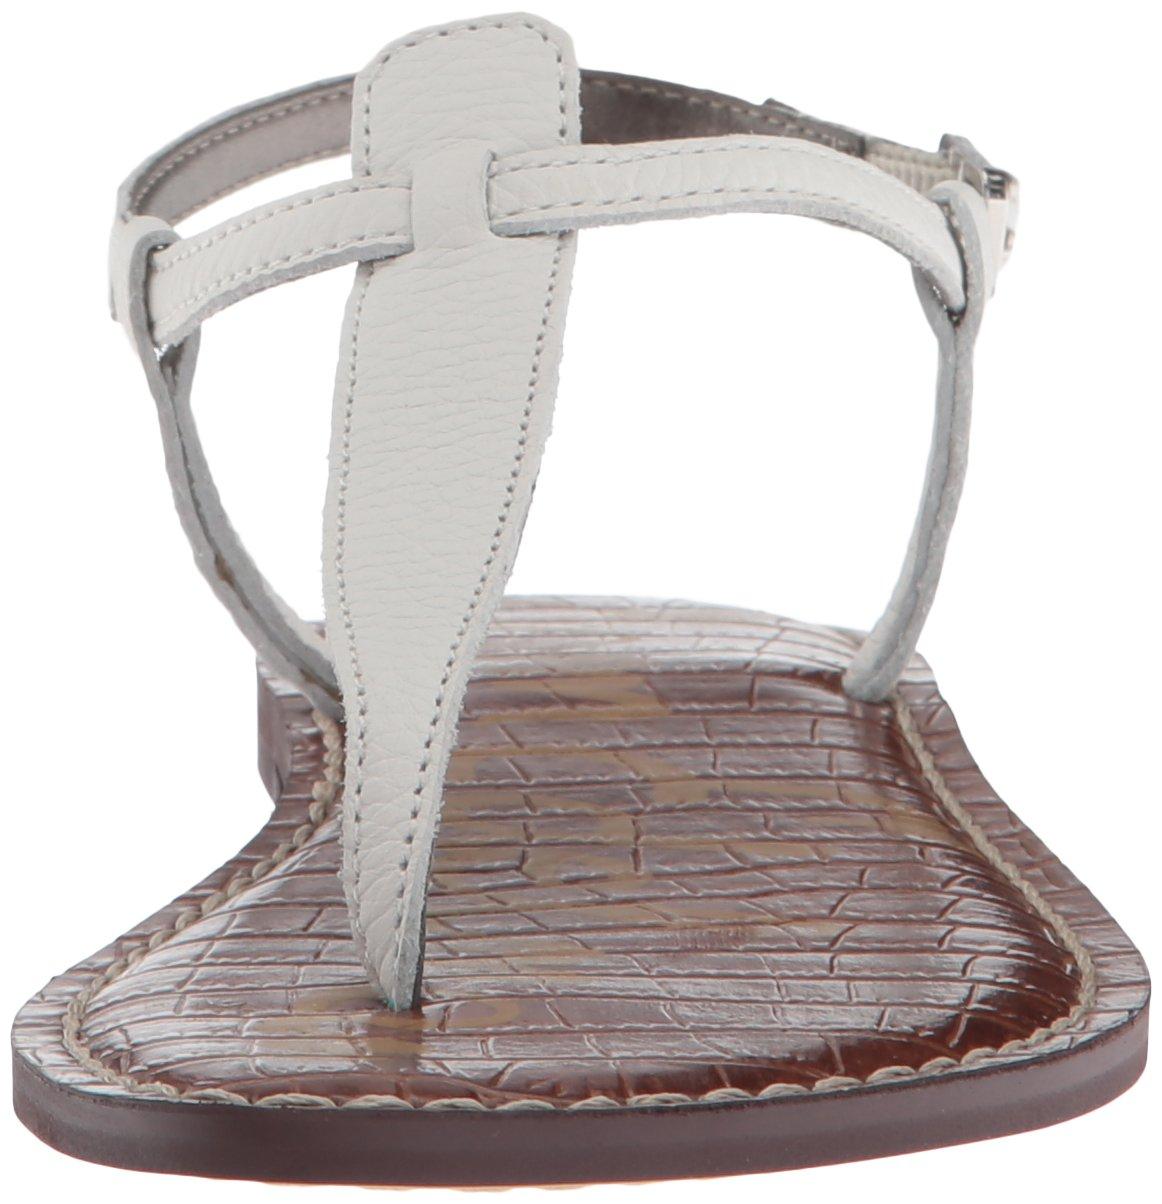 Sam Edelman Women's Gigi Leather B076NY3HL9 5.5 B(M) US Bright White Leather